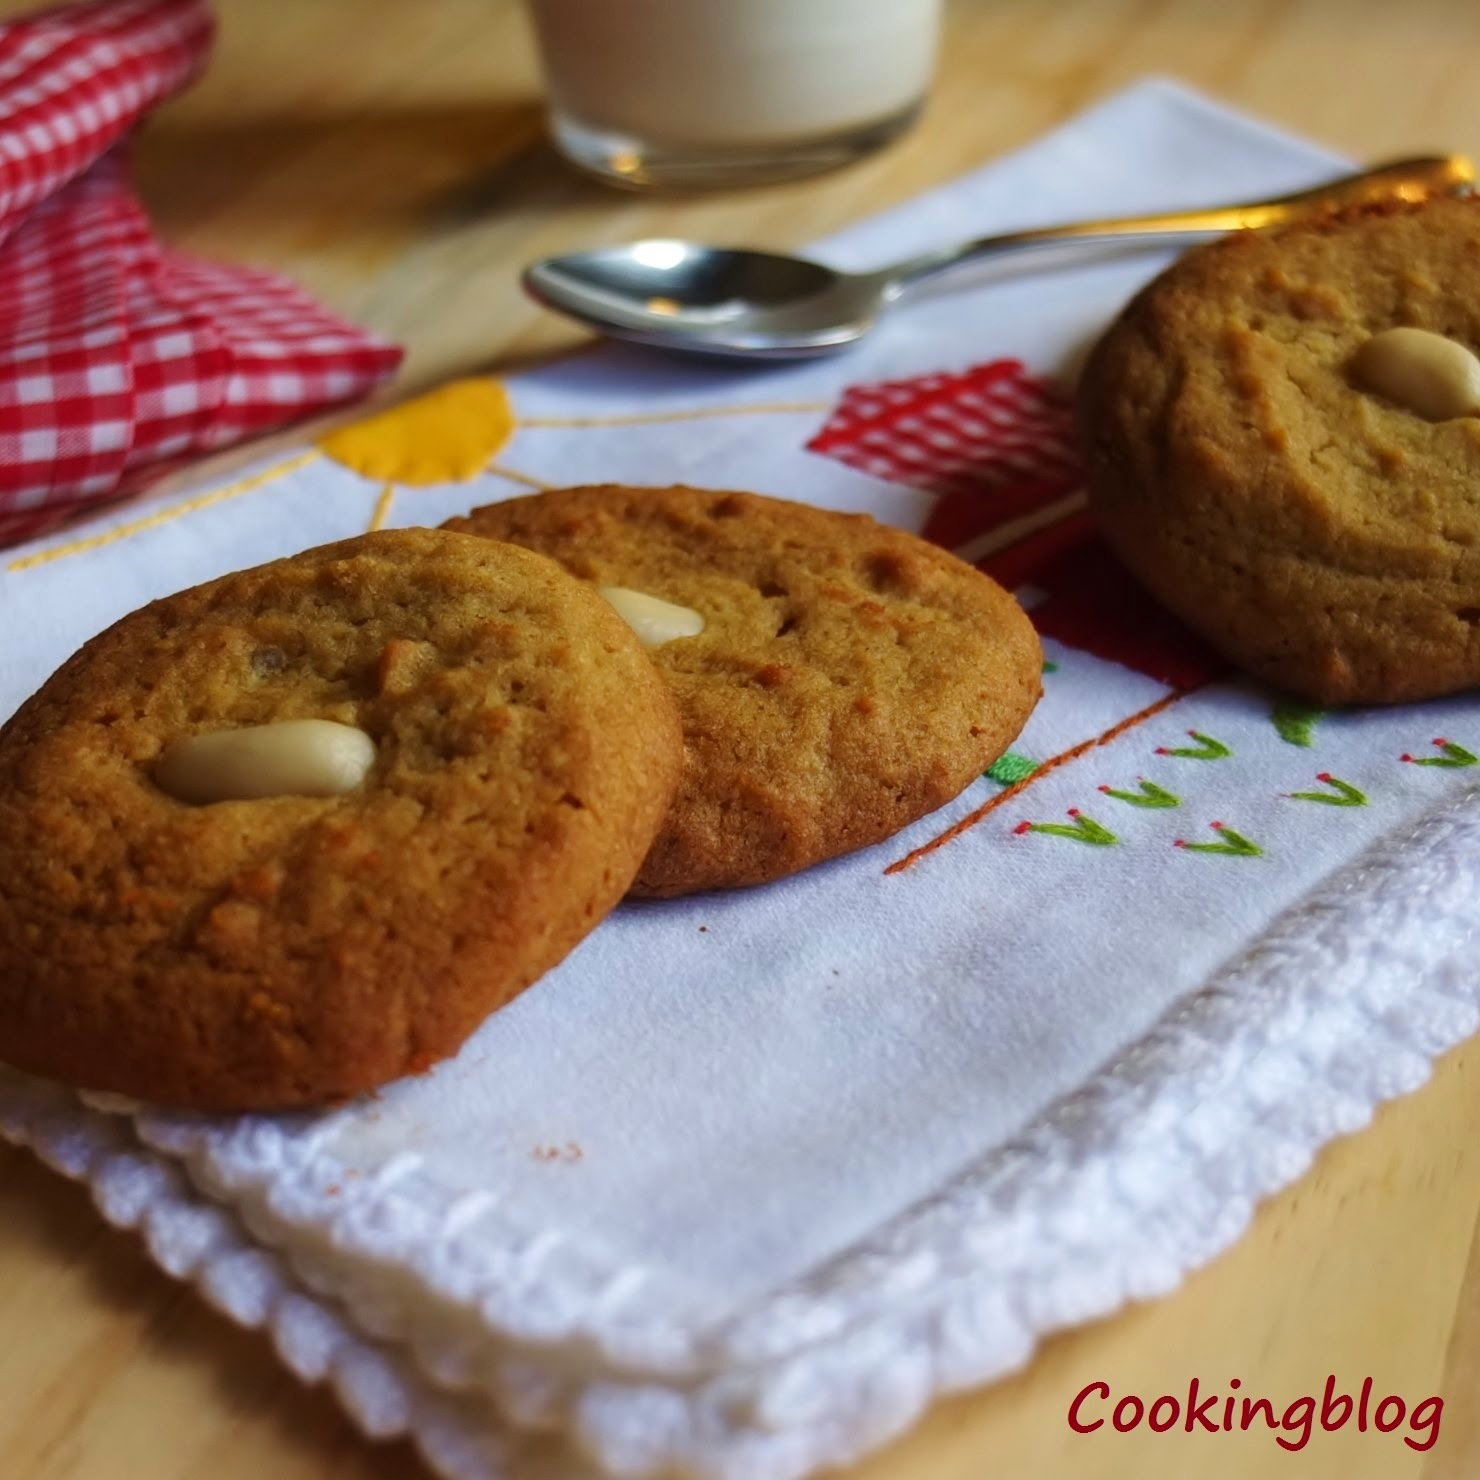 Biscoitos de quinoa e manteiga de amendoim | Quinoa and peanut butter cookies